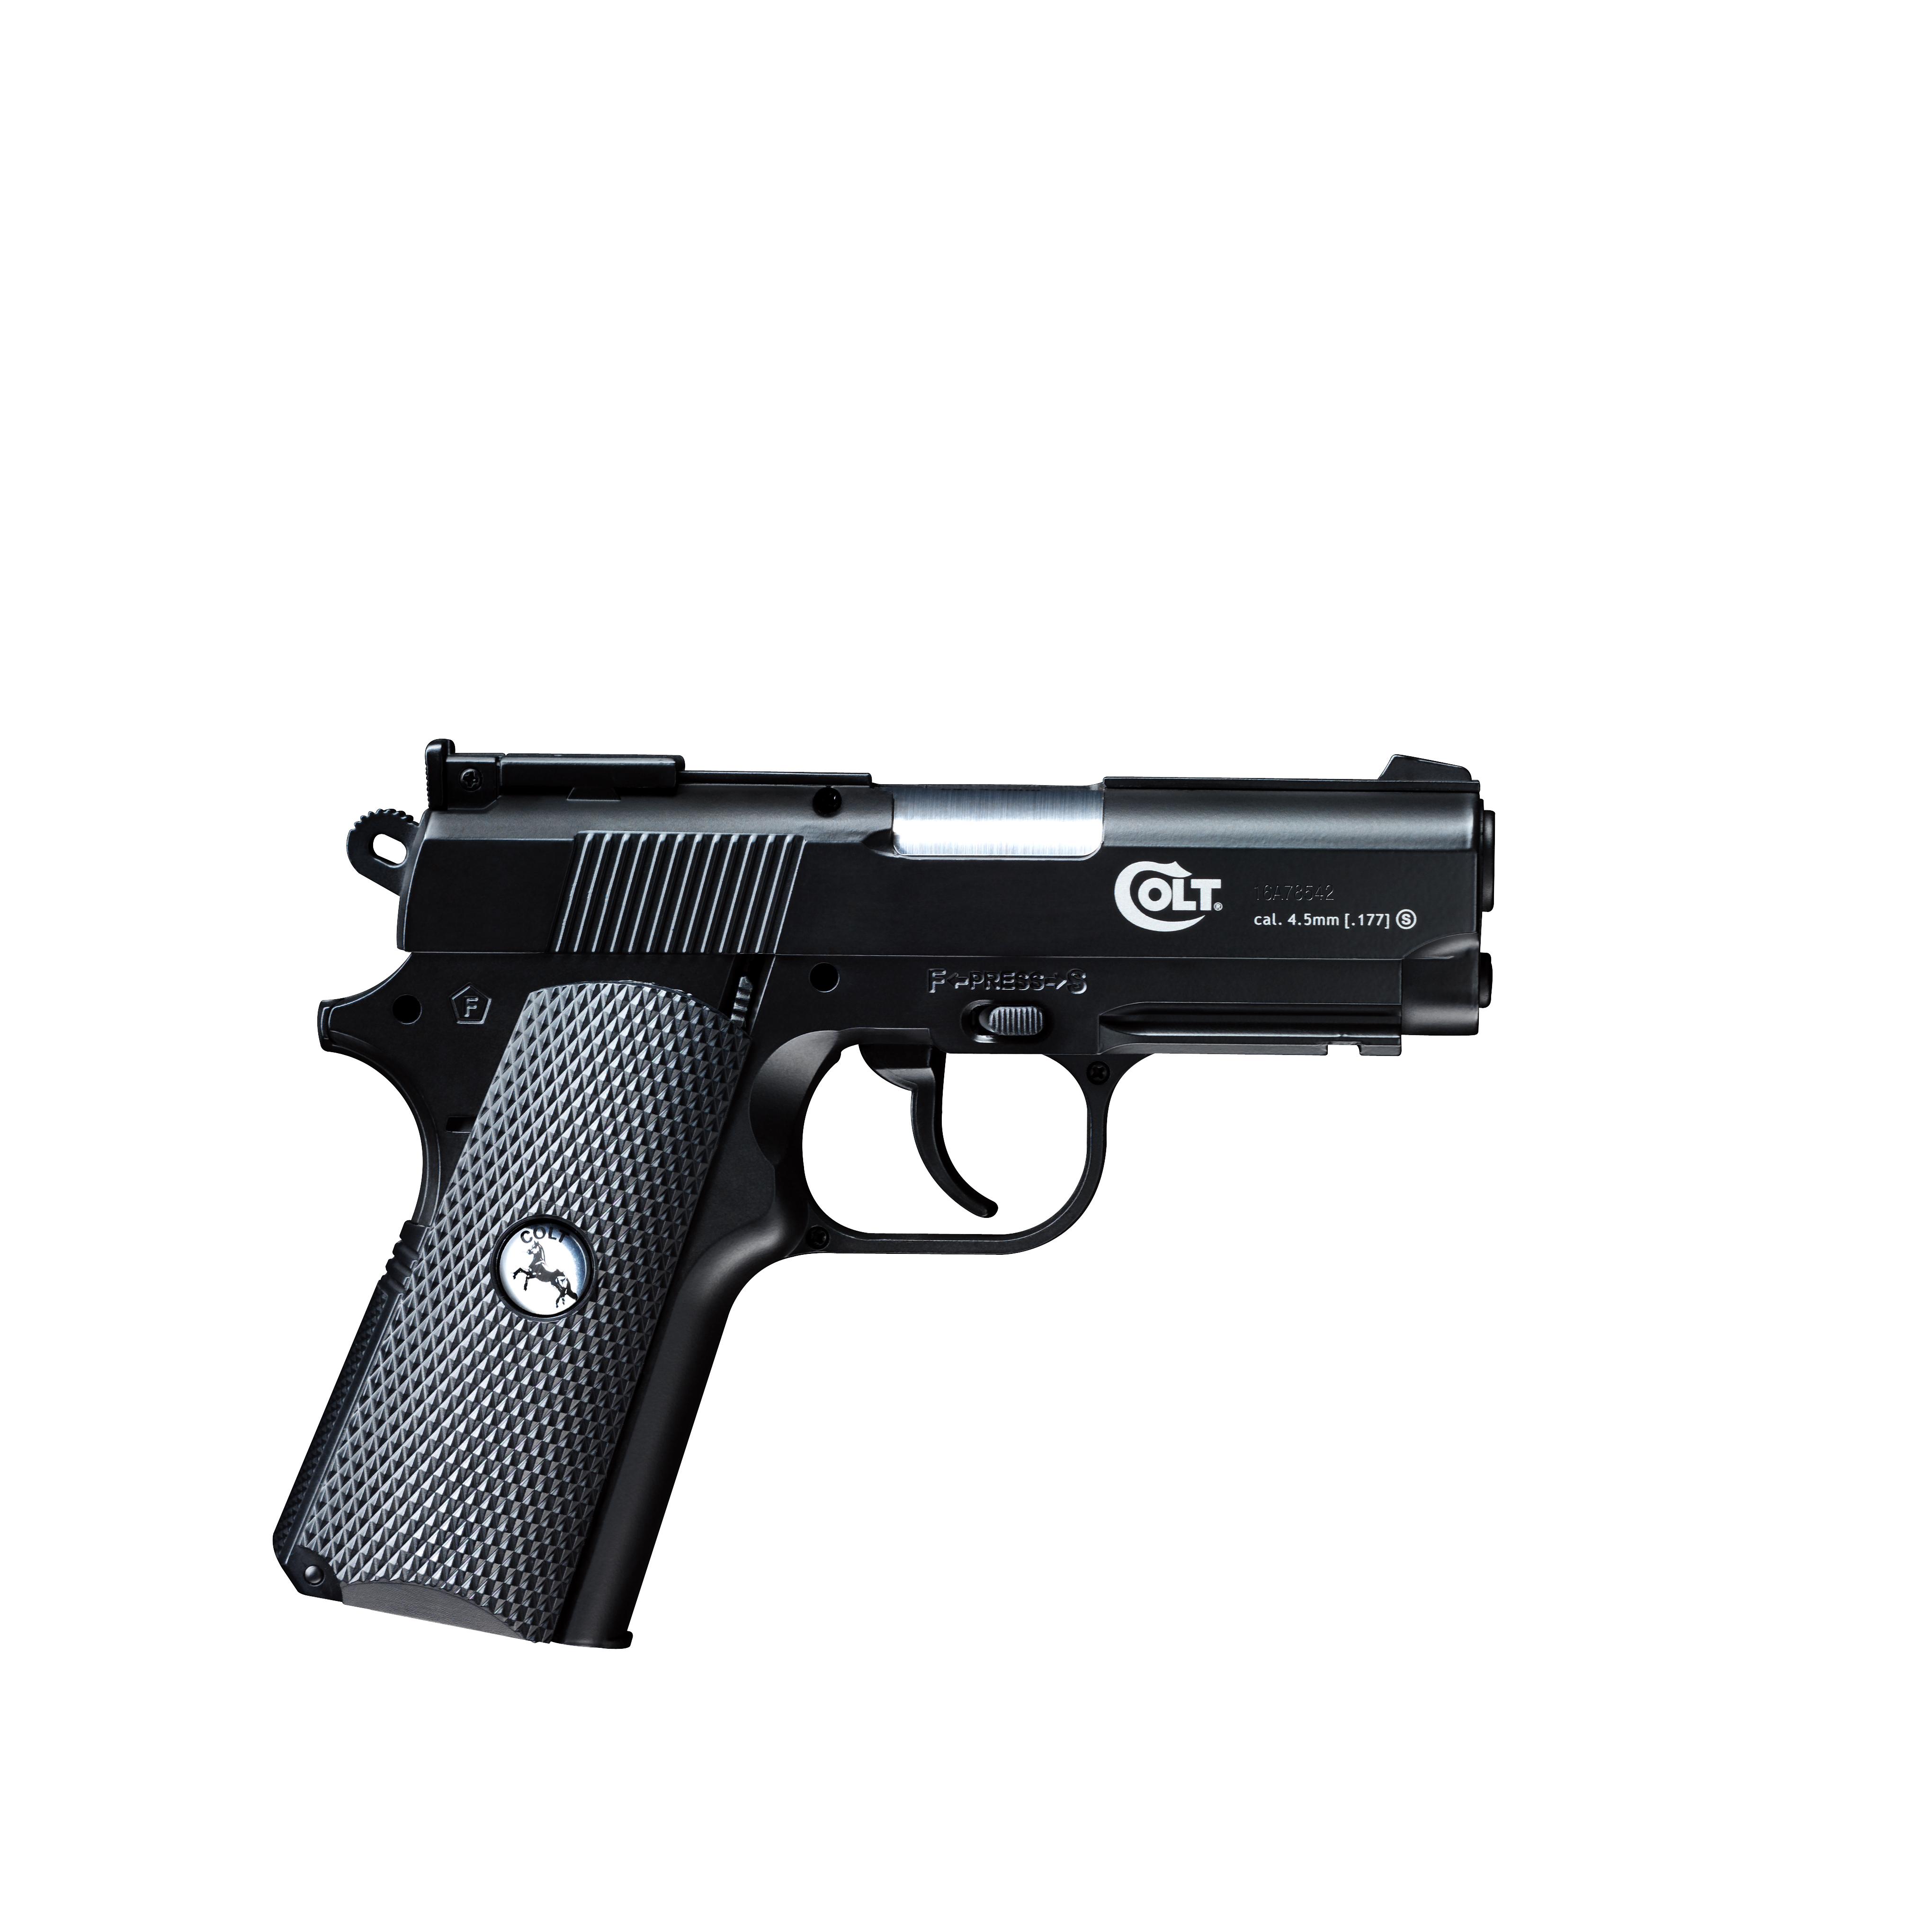 COLT (Umarex) CO2 Airgun Replica Defender